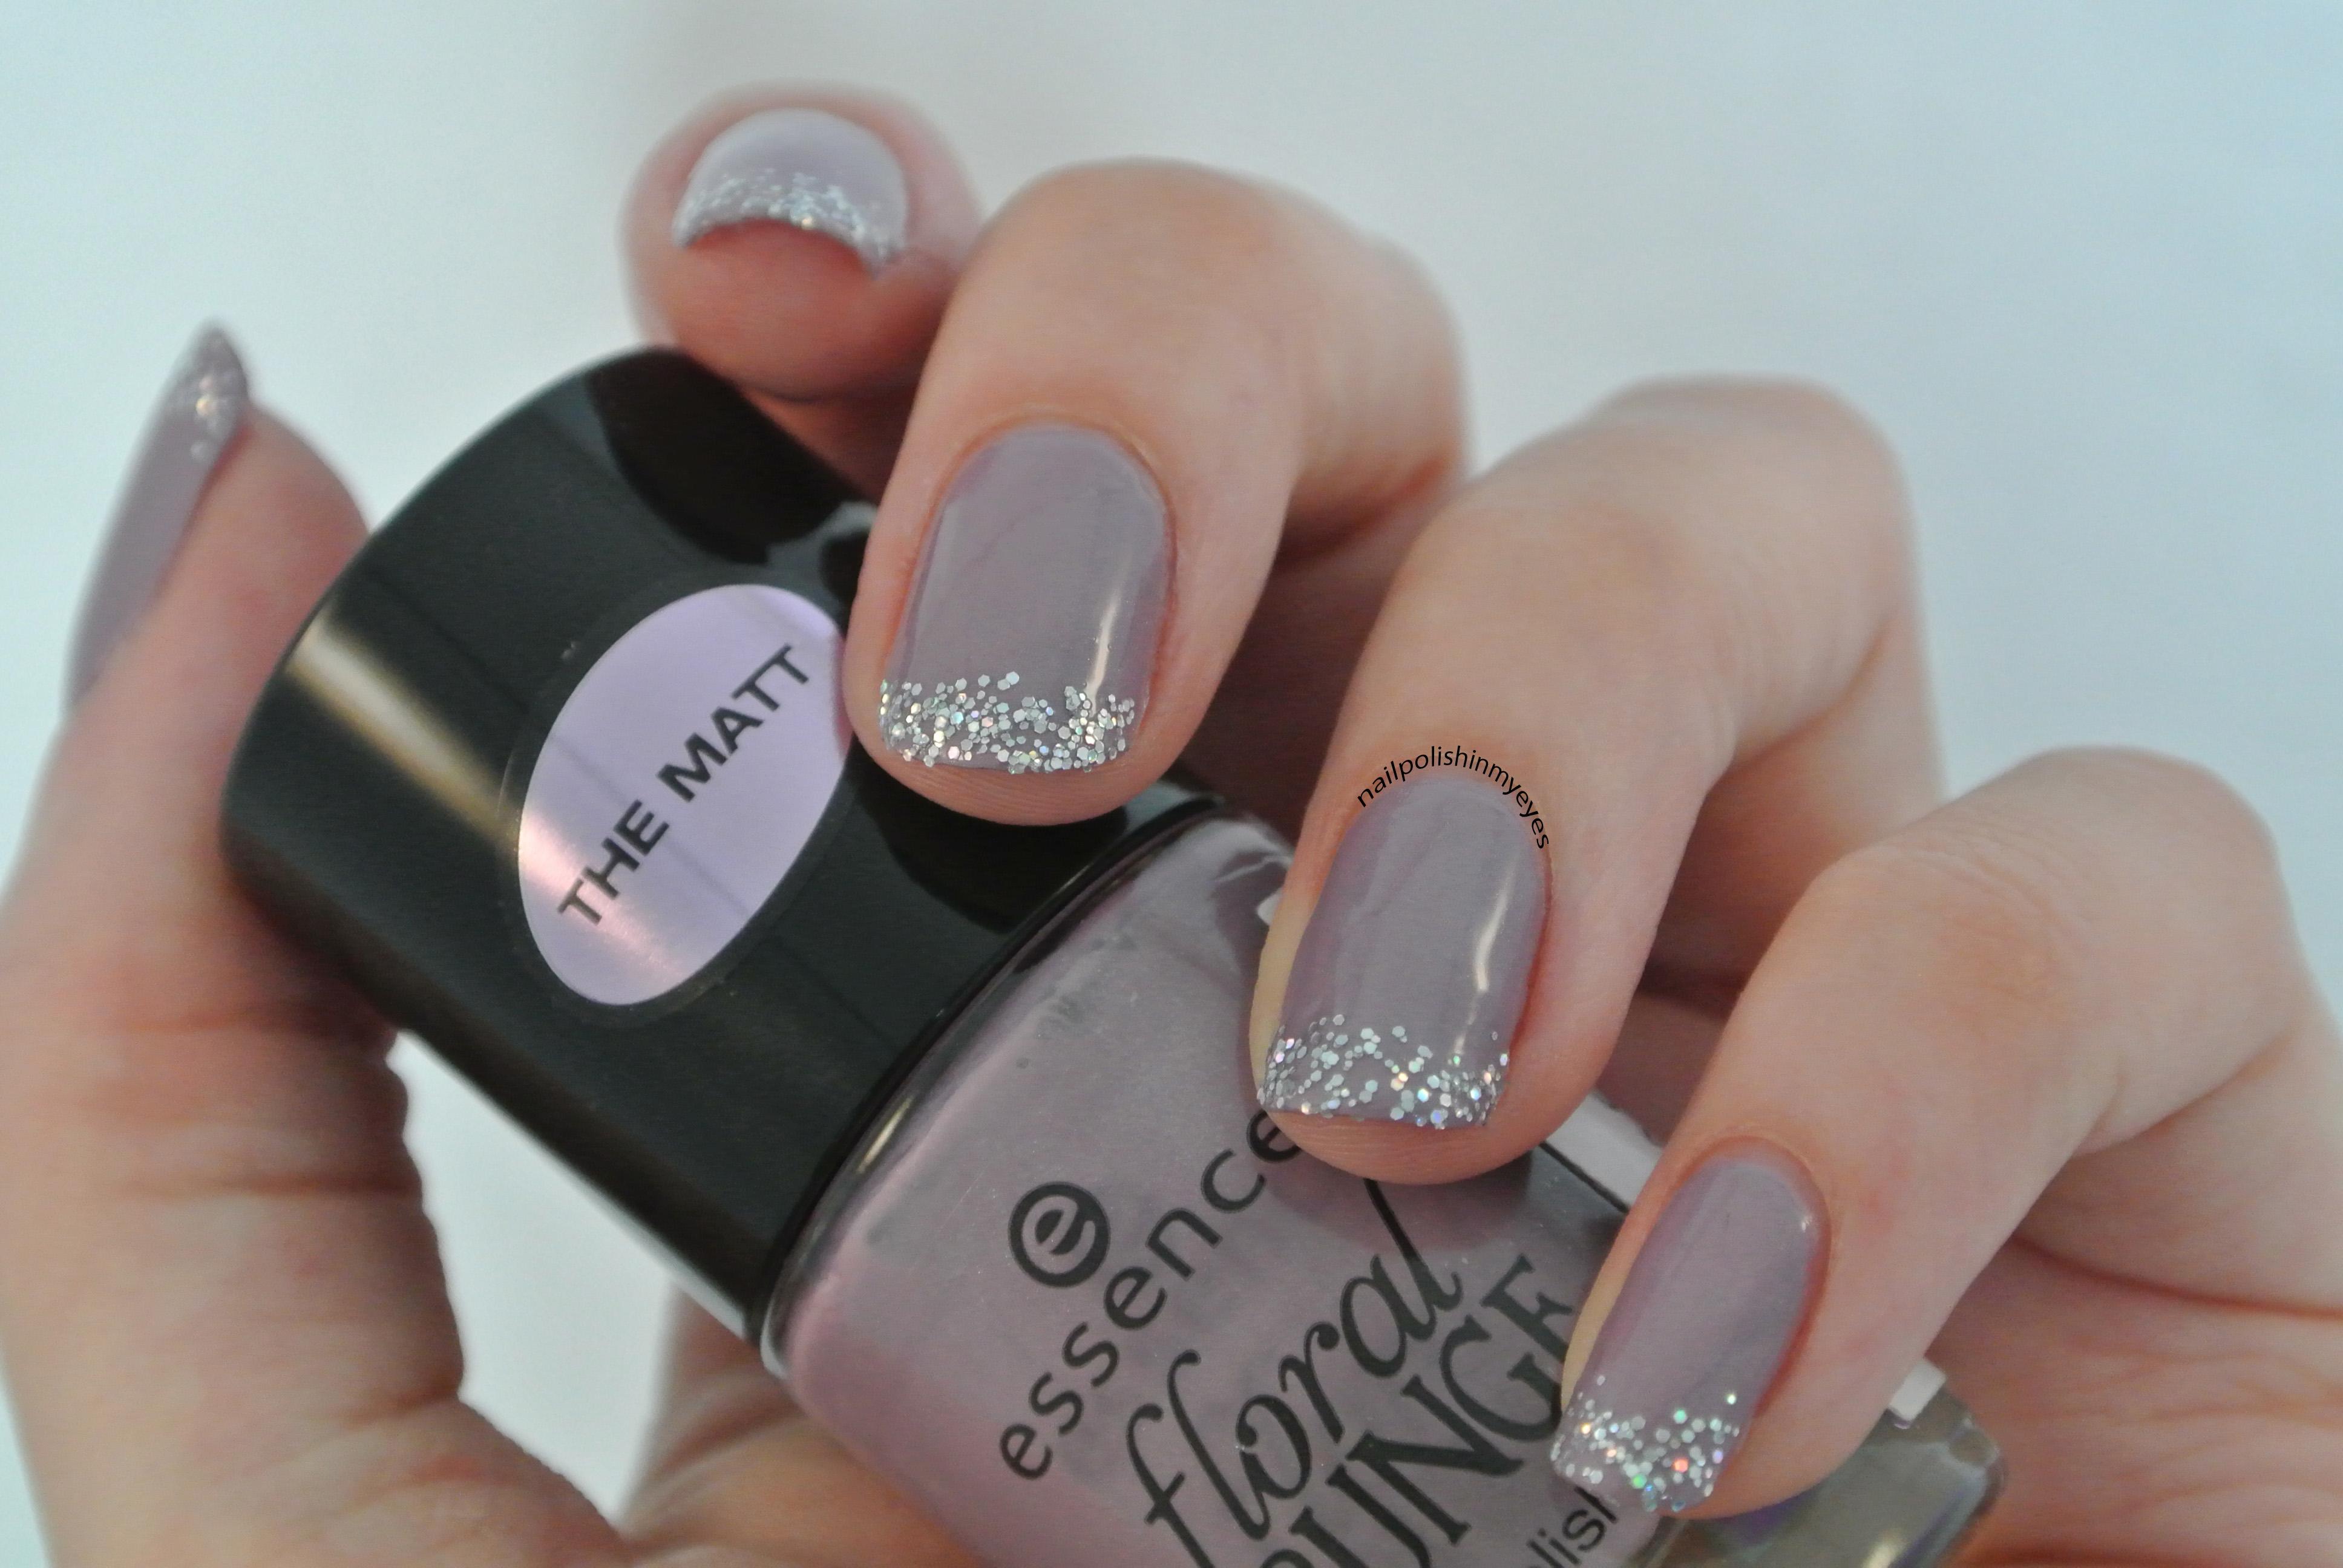 Purple & Glitter French Manicure | Nail Polish in my Eyes